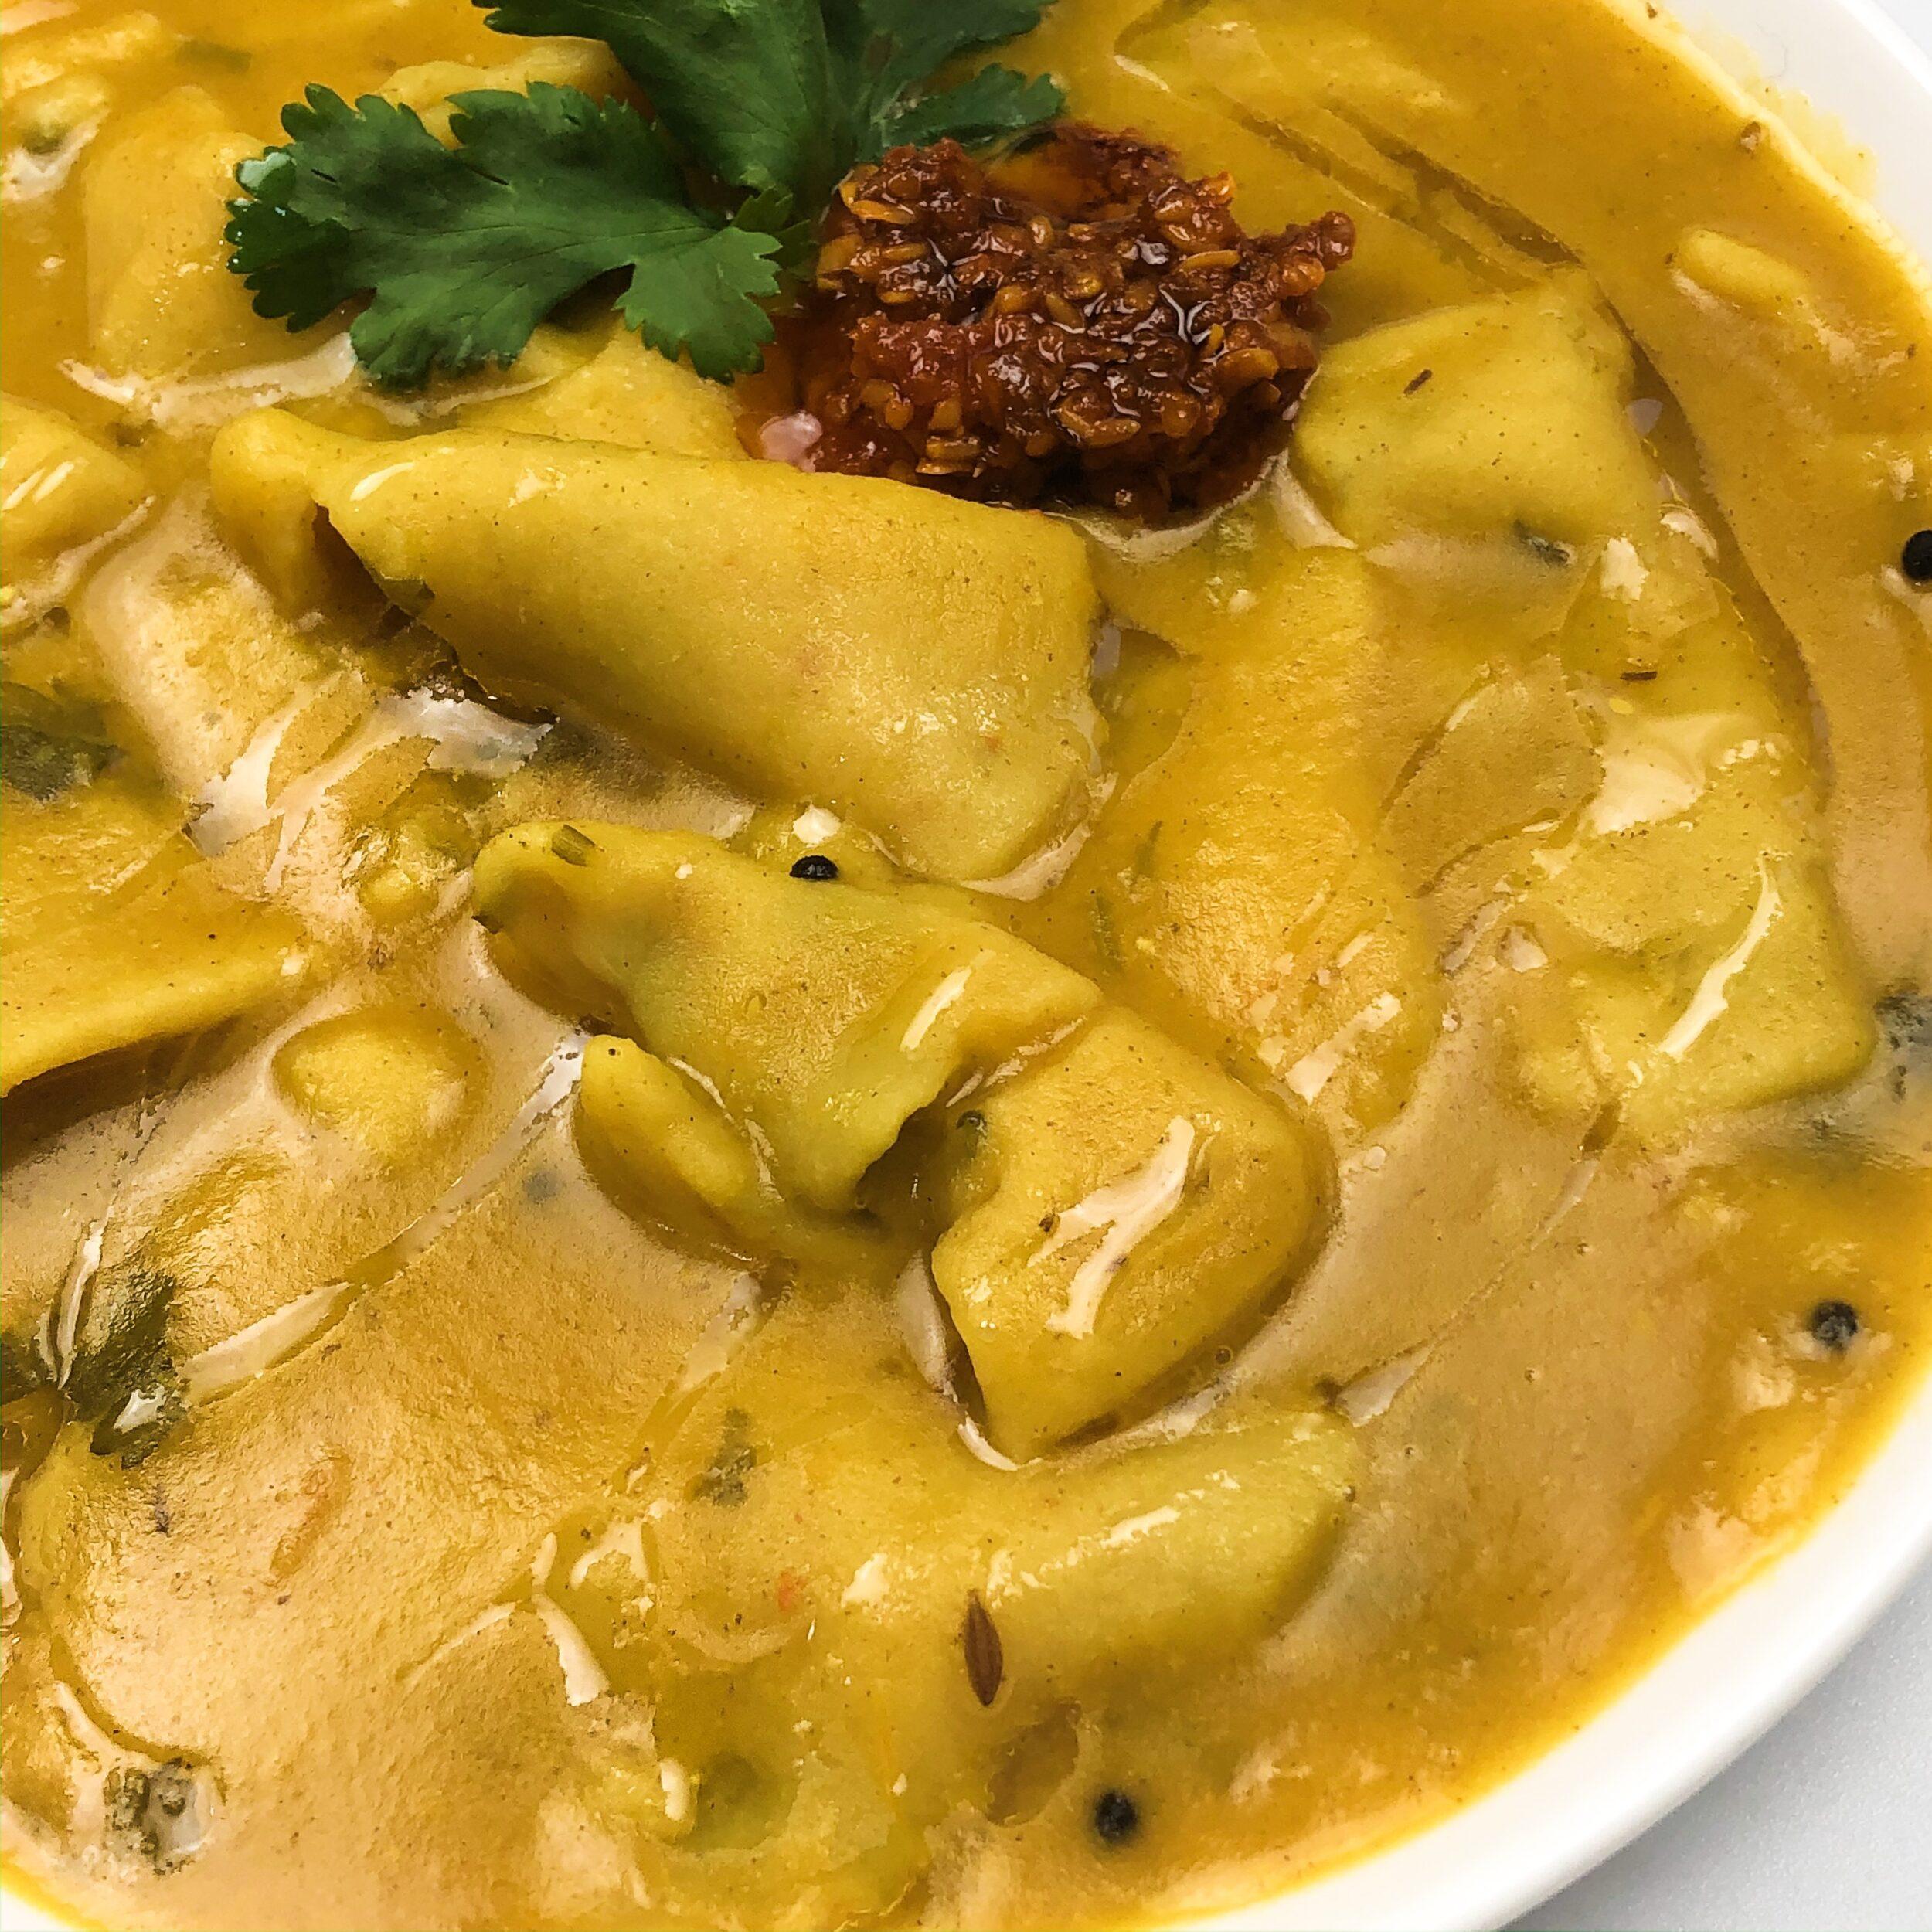 dal dhokri instant pot sambar lentil soup wheat dumplings